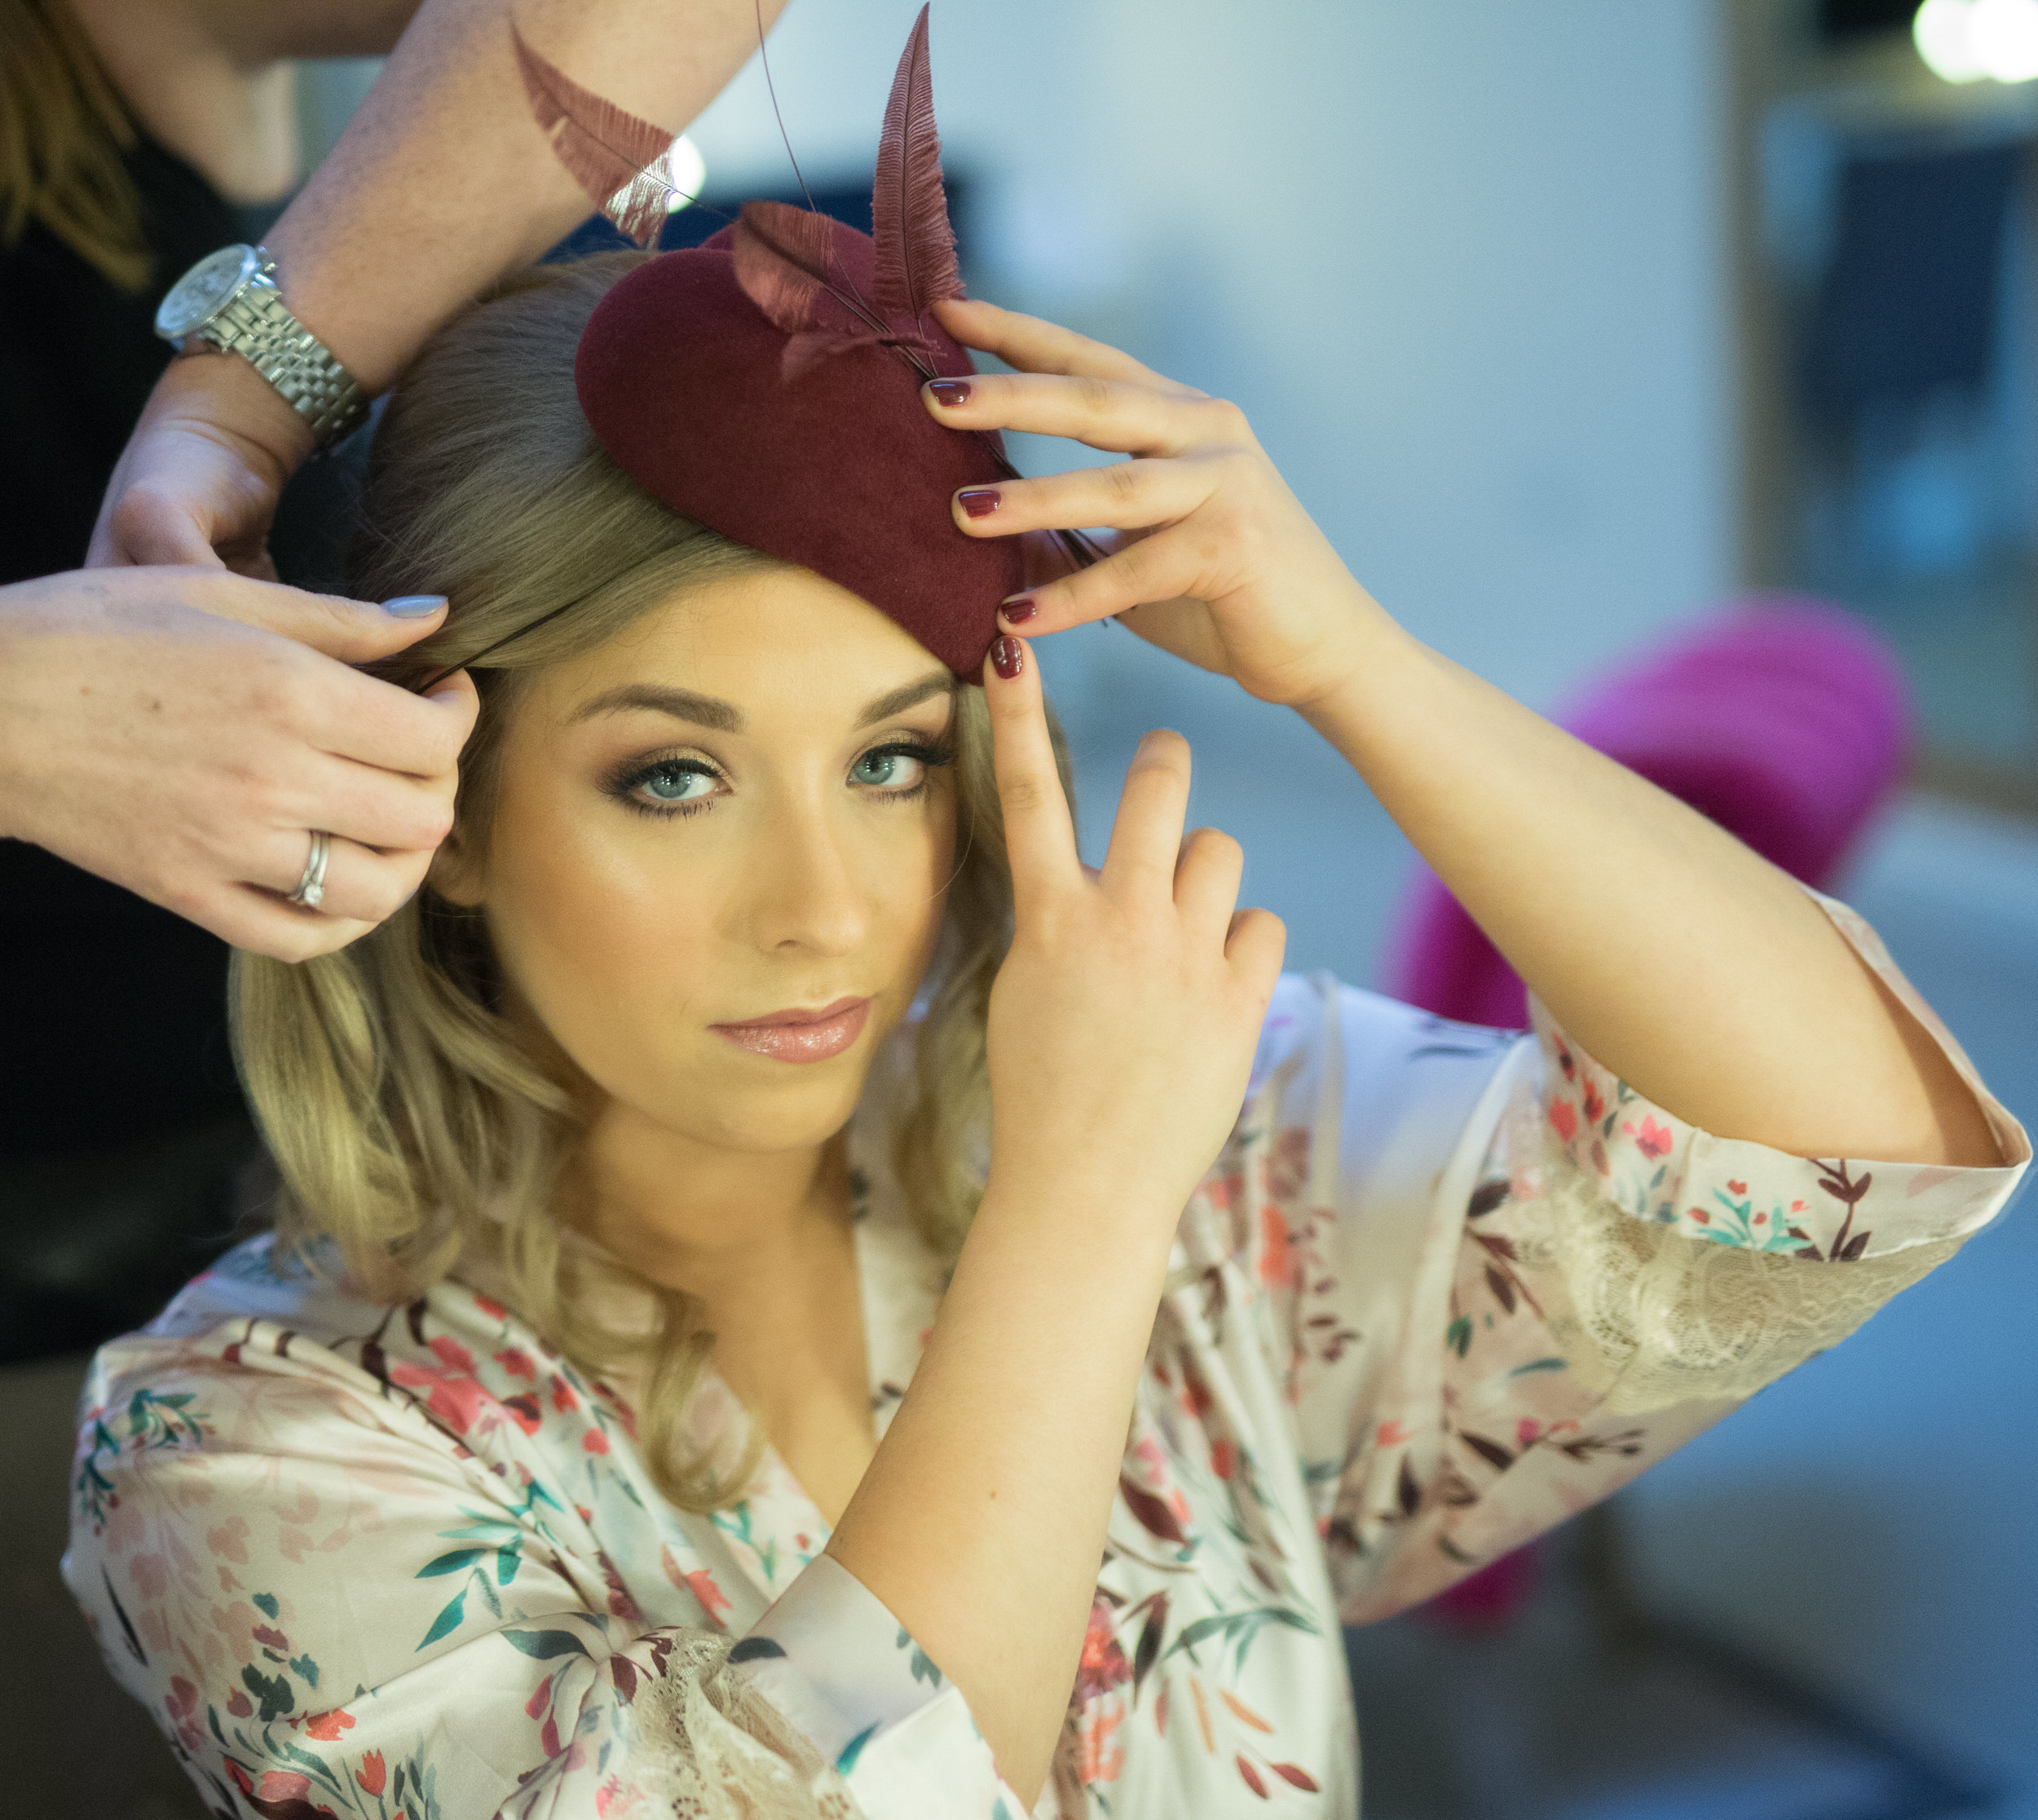 Phoebe makeup and hair